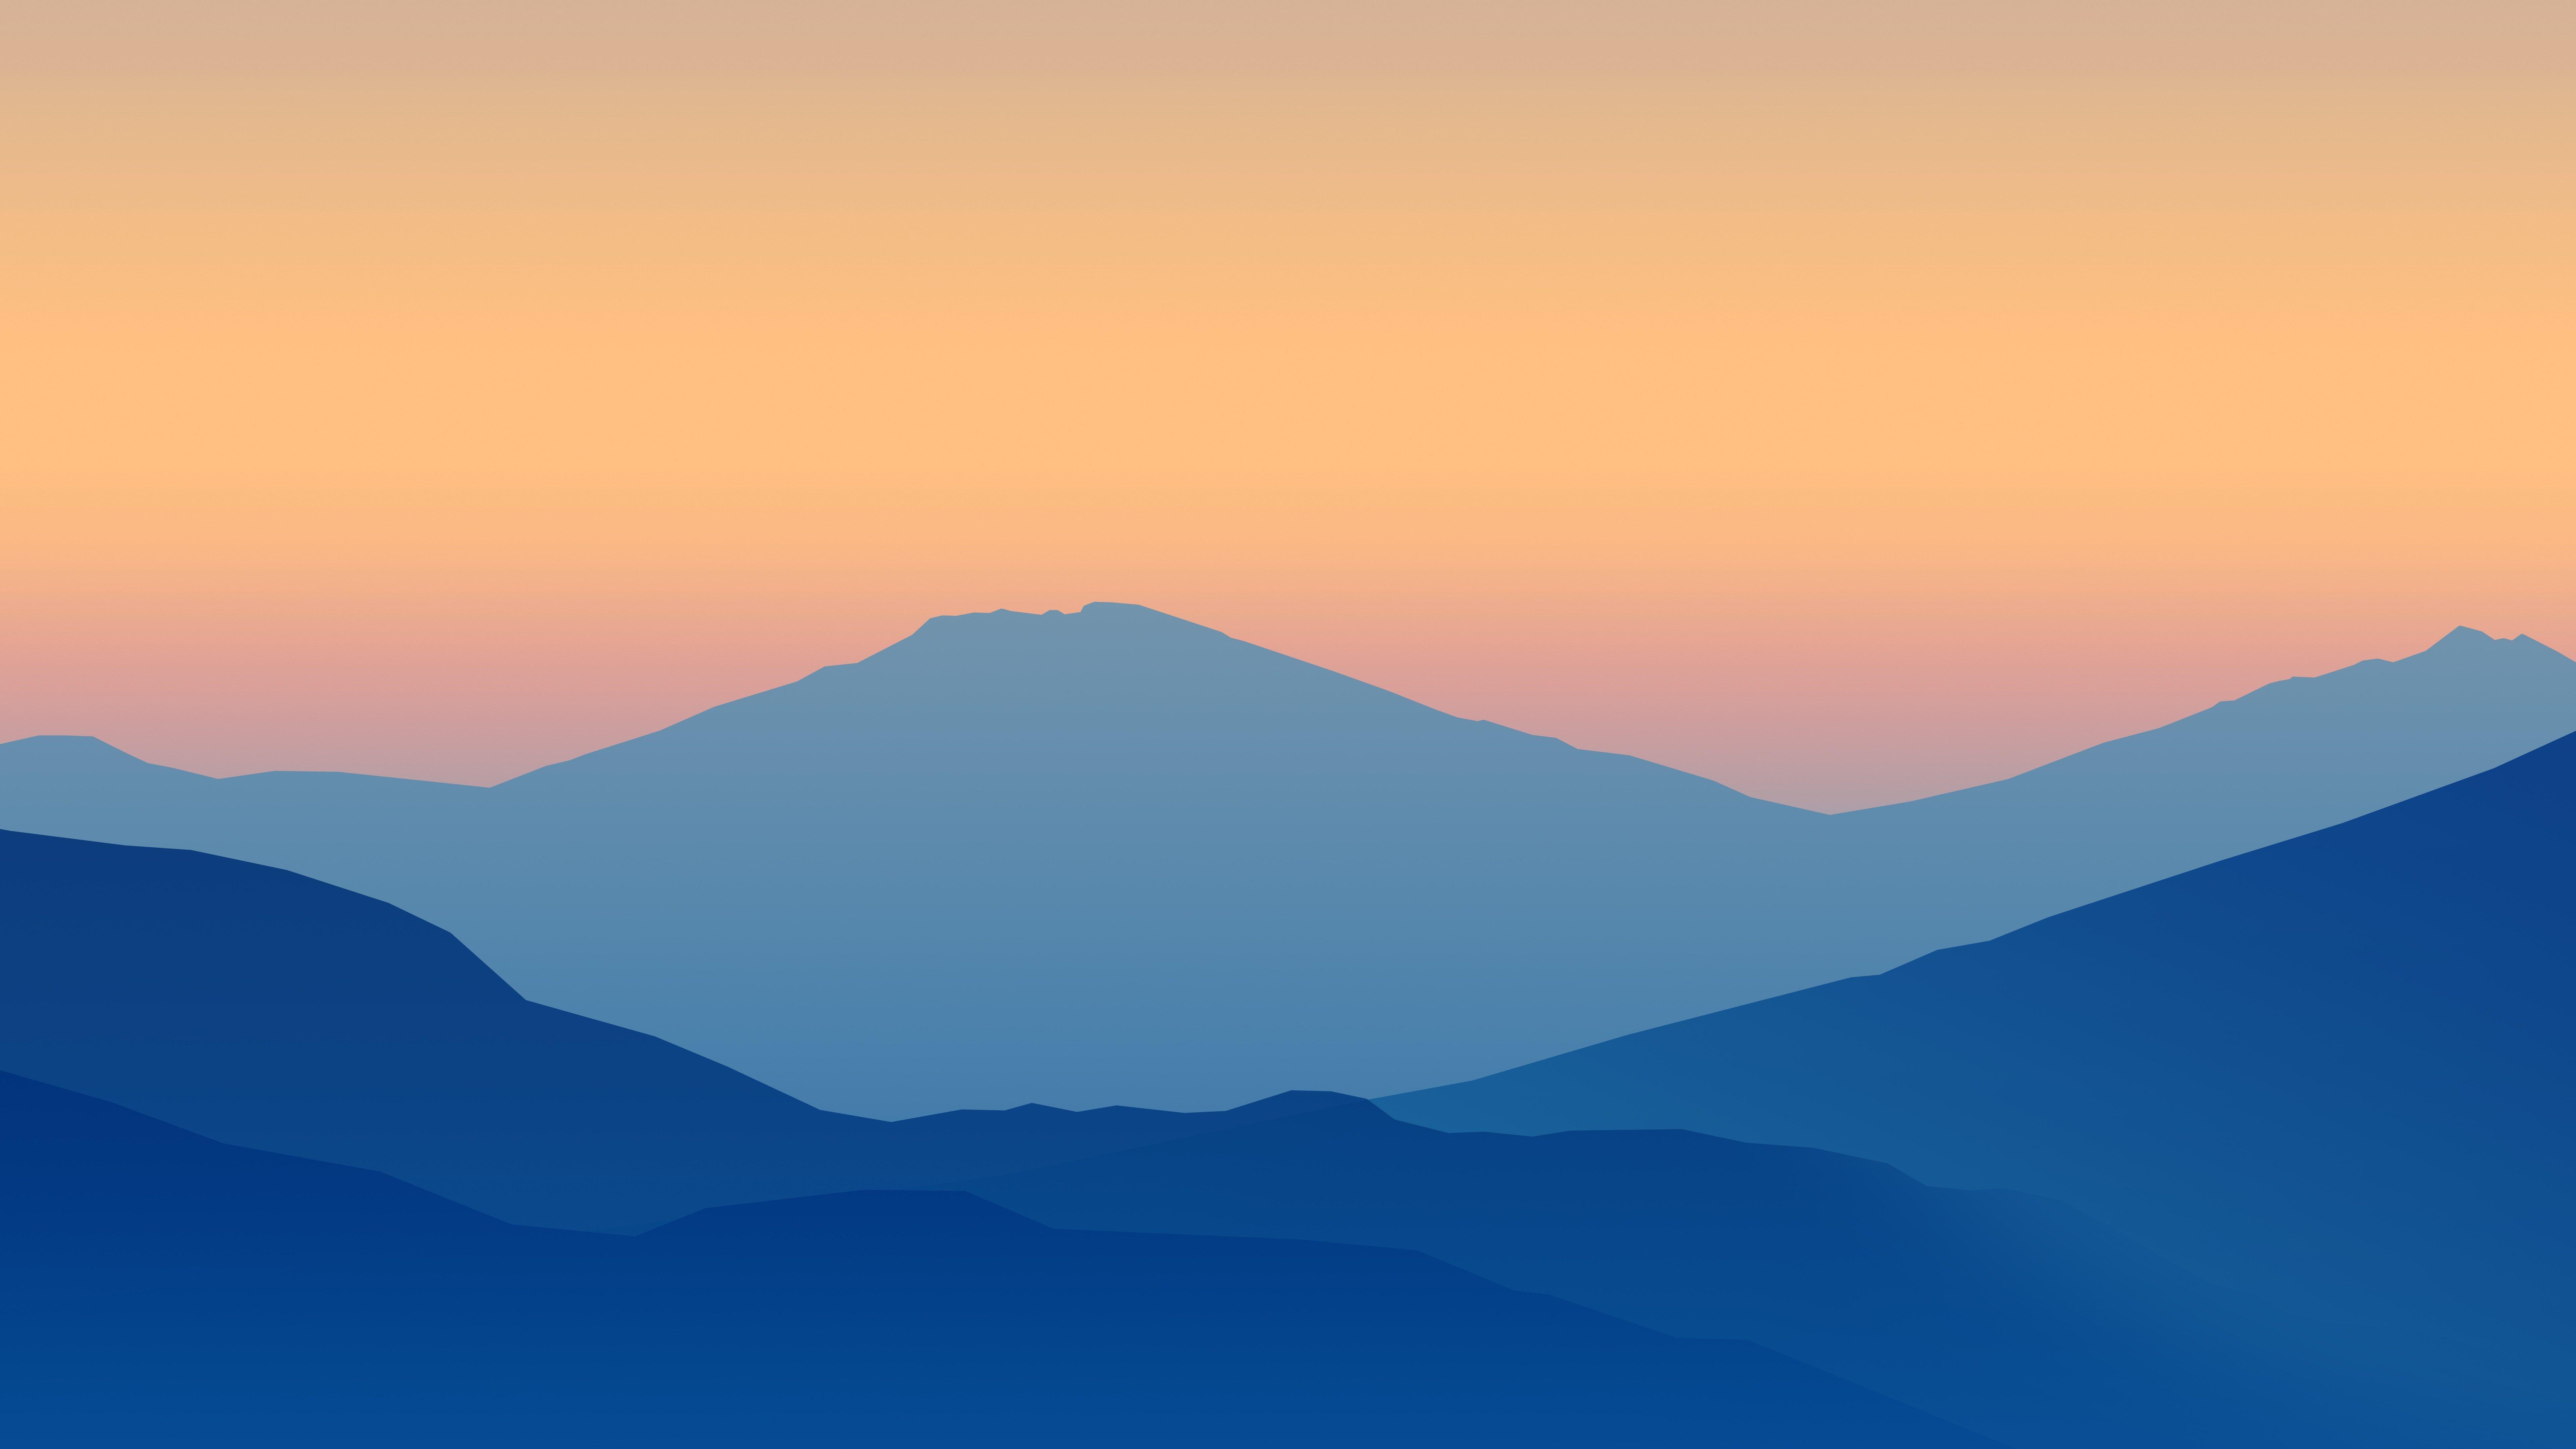 free desktop 8k wallpapers Обои